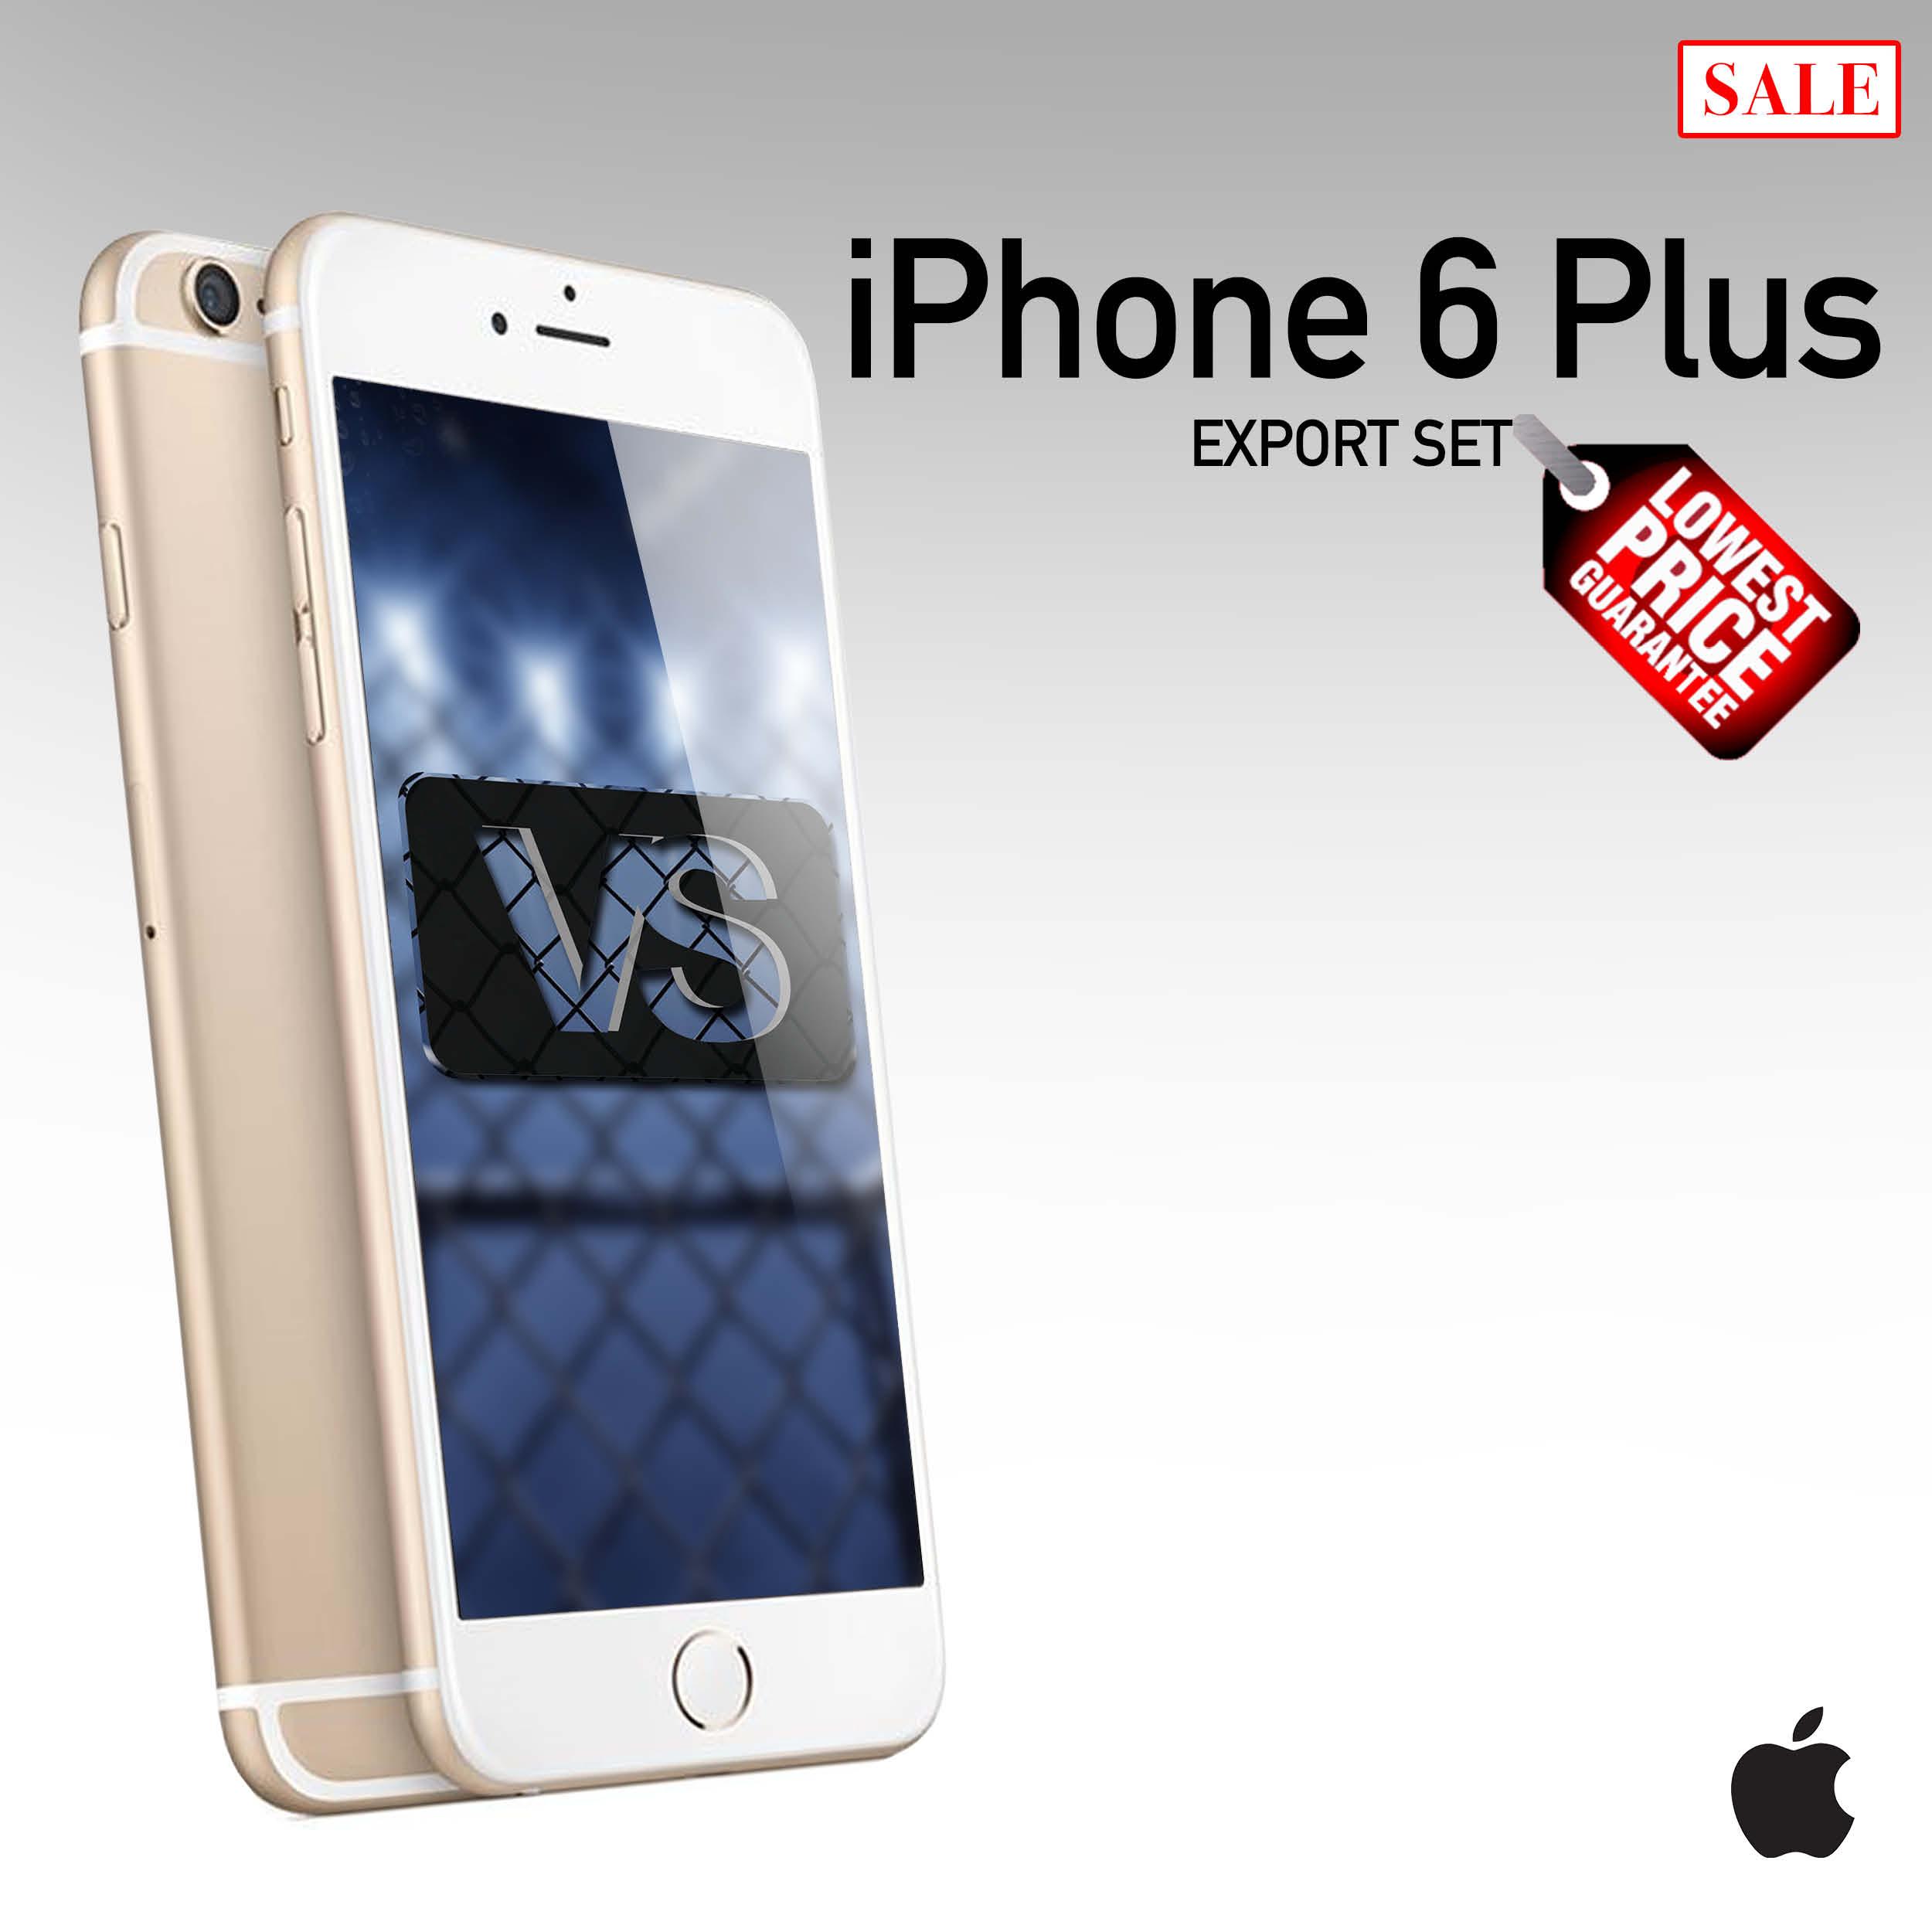 b0d2e52b595b5 Apple iPhone 6 Plus 16 64 128Gb (Factory Refurbished)Sealed